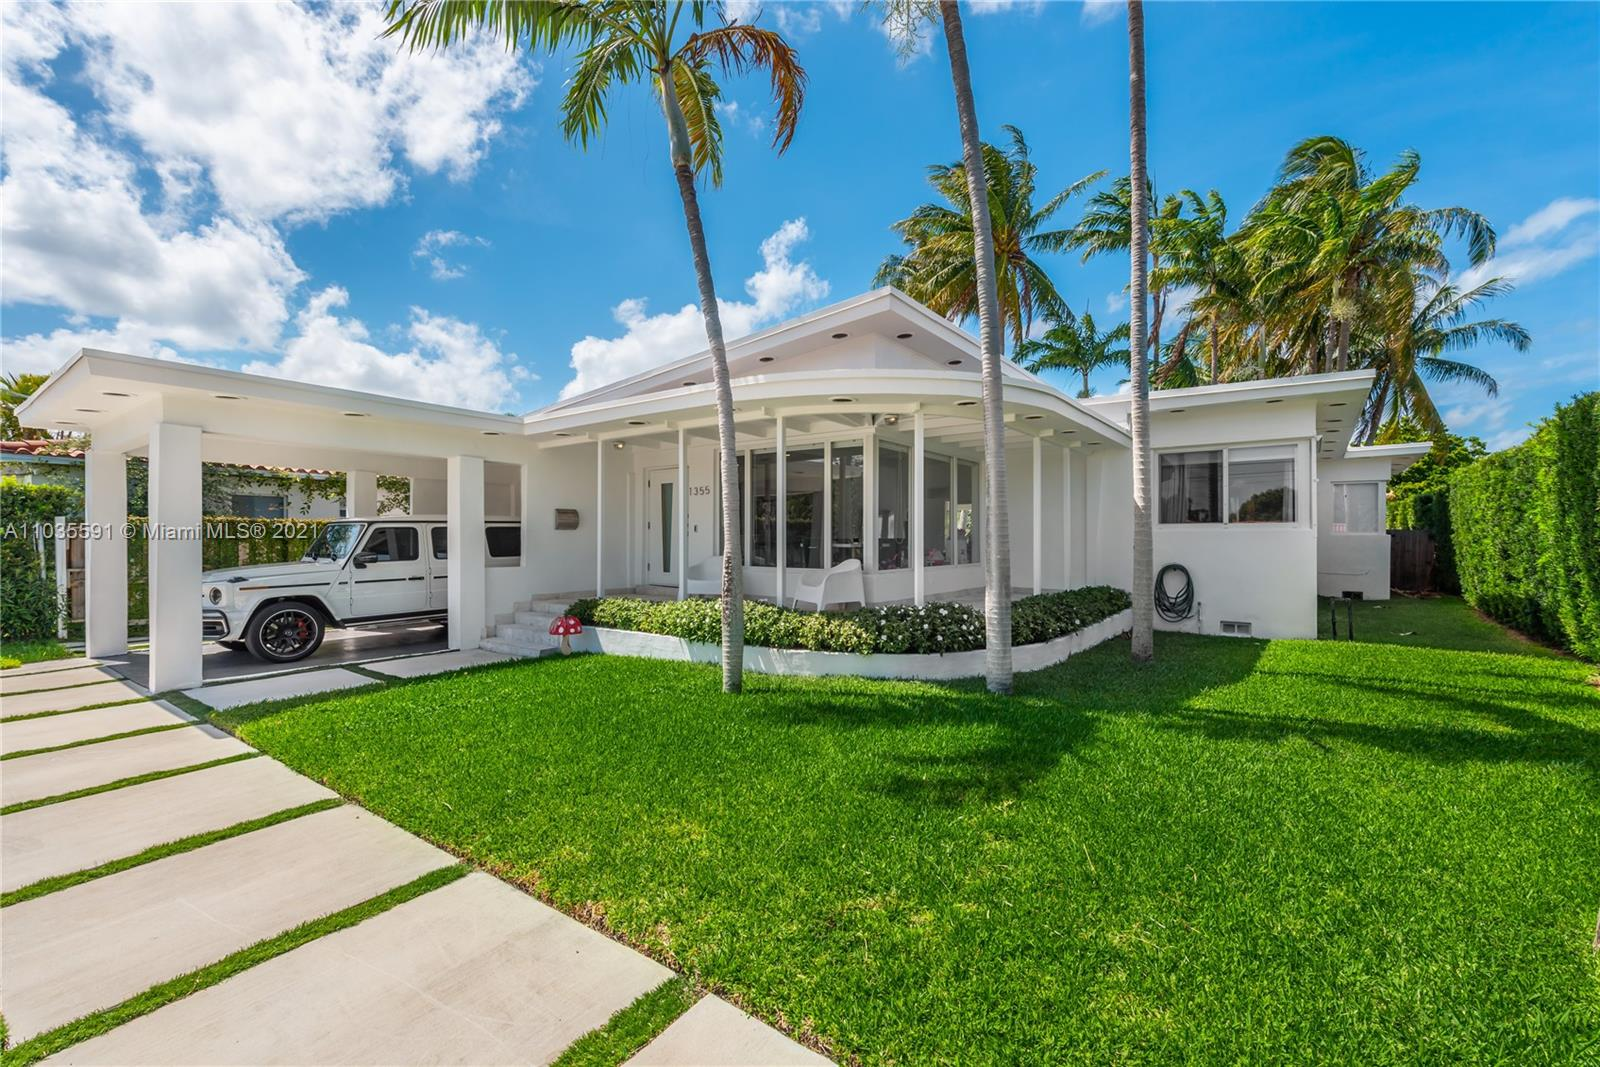 Biscayne Point - 1355 Daytonia Rd, Miami Beach, FL 33141